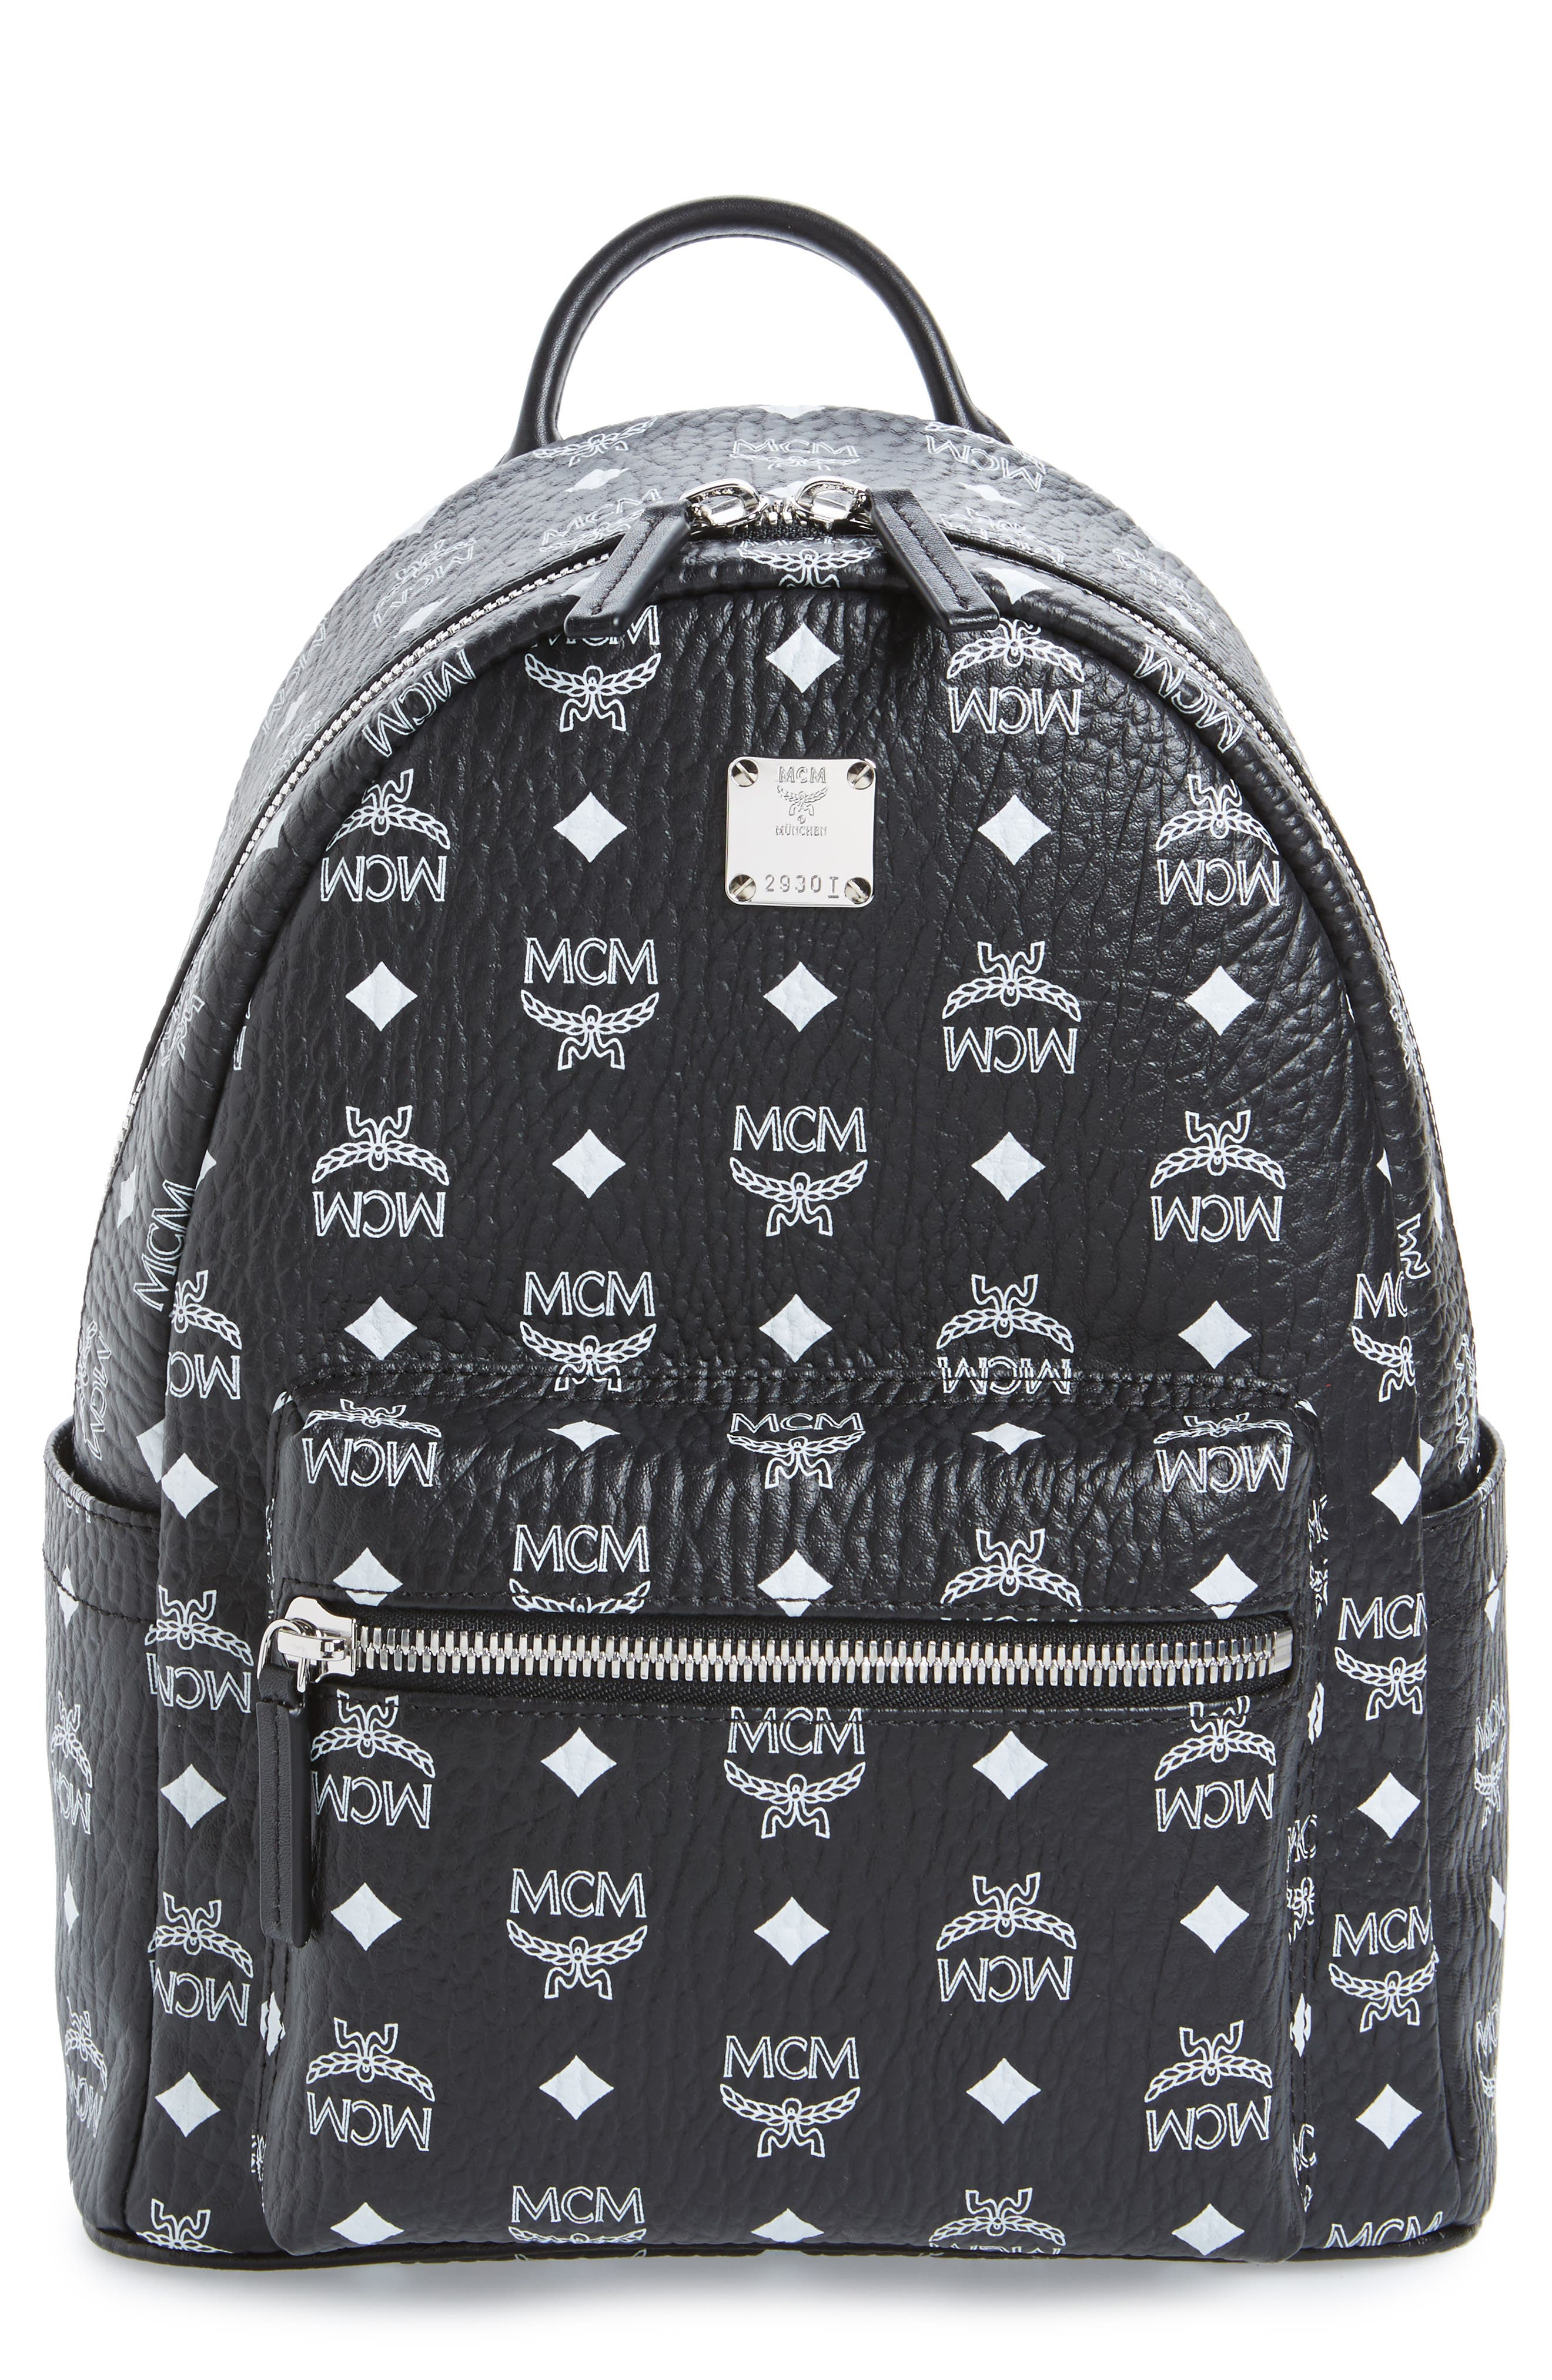 MCM Small Stark Monogram Print Canvas Backpack